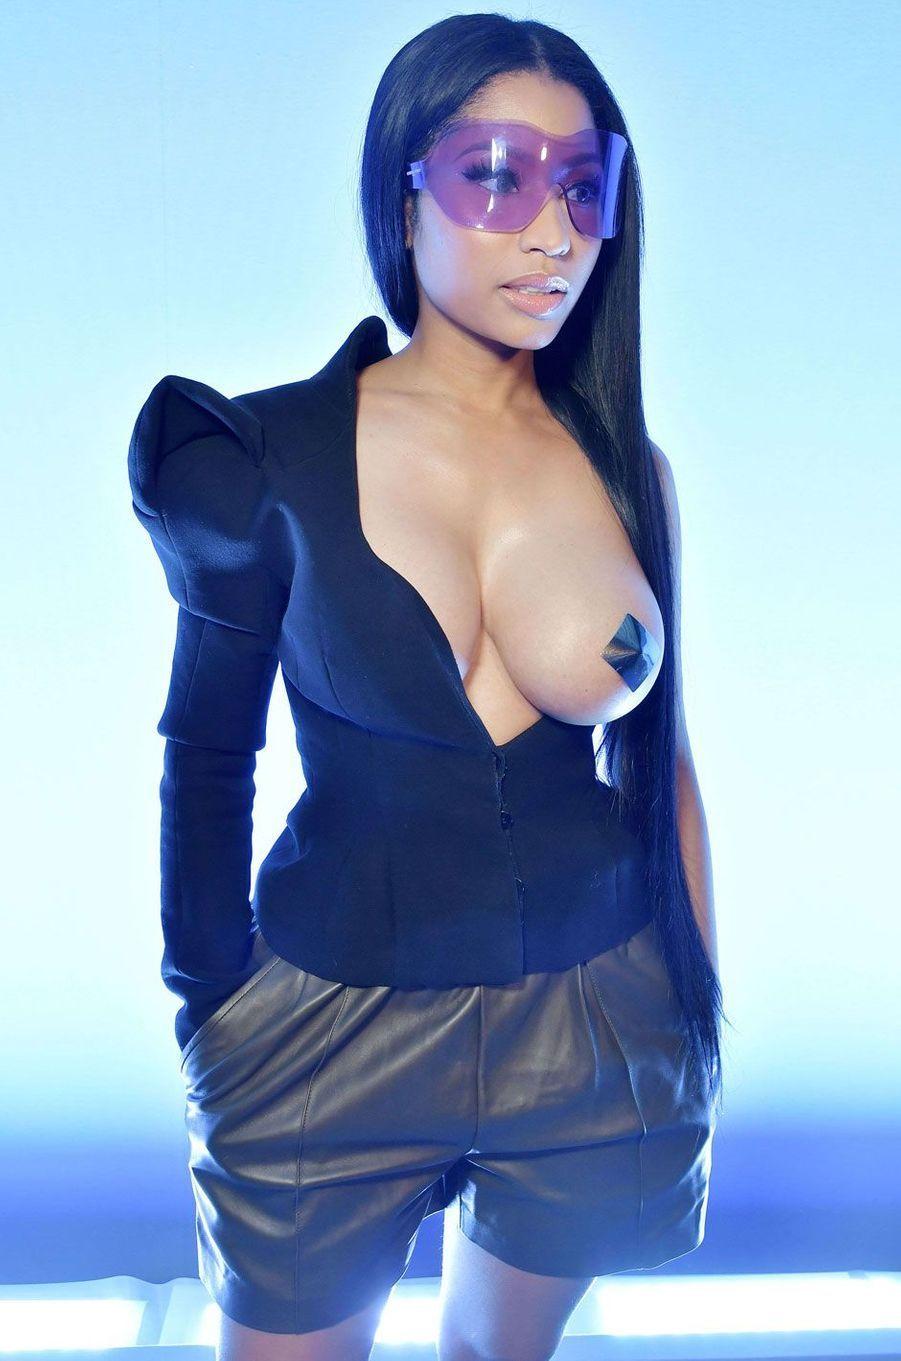 La rappeuse Nicki Minaj à Paris.